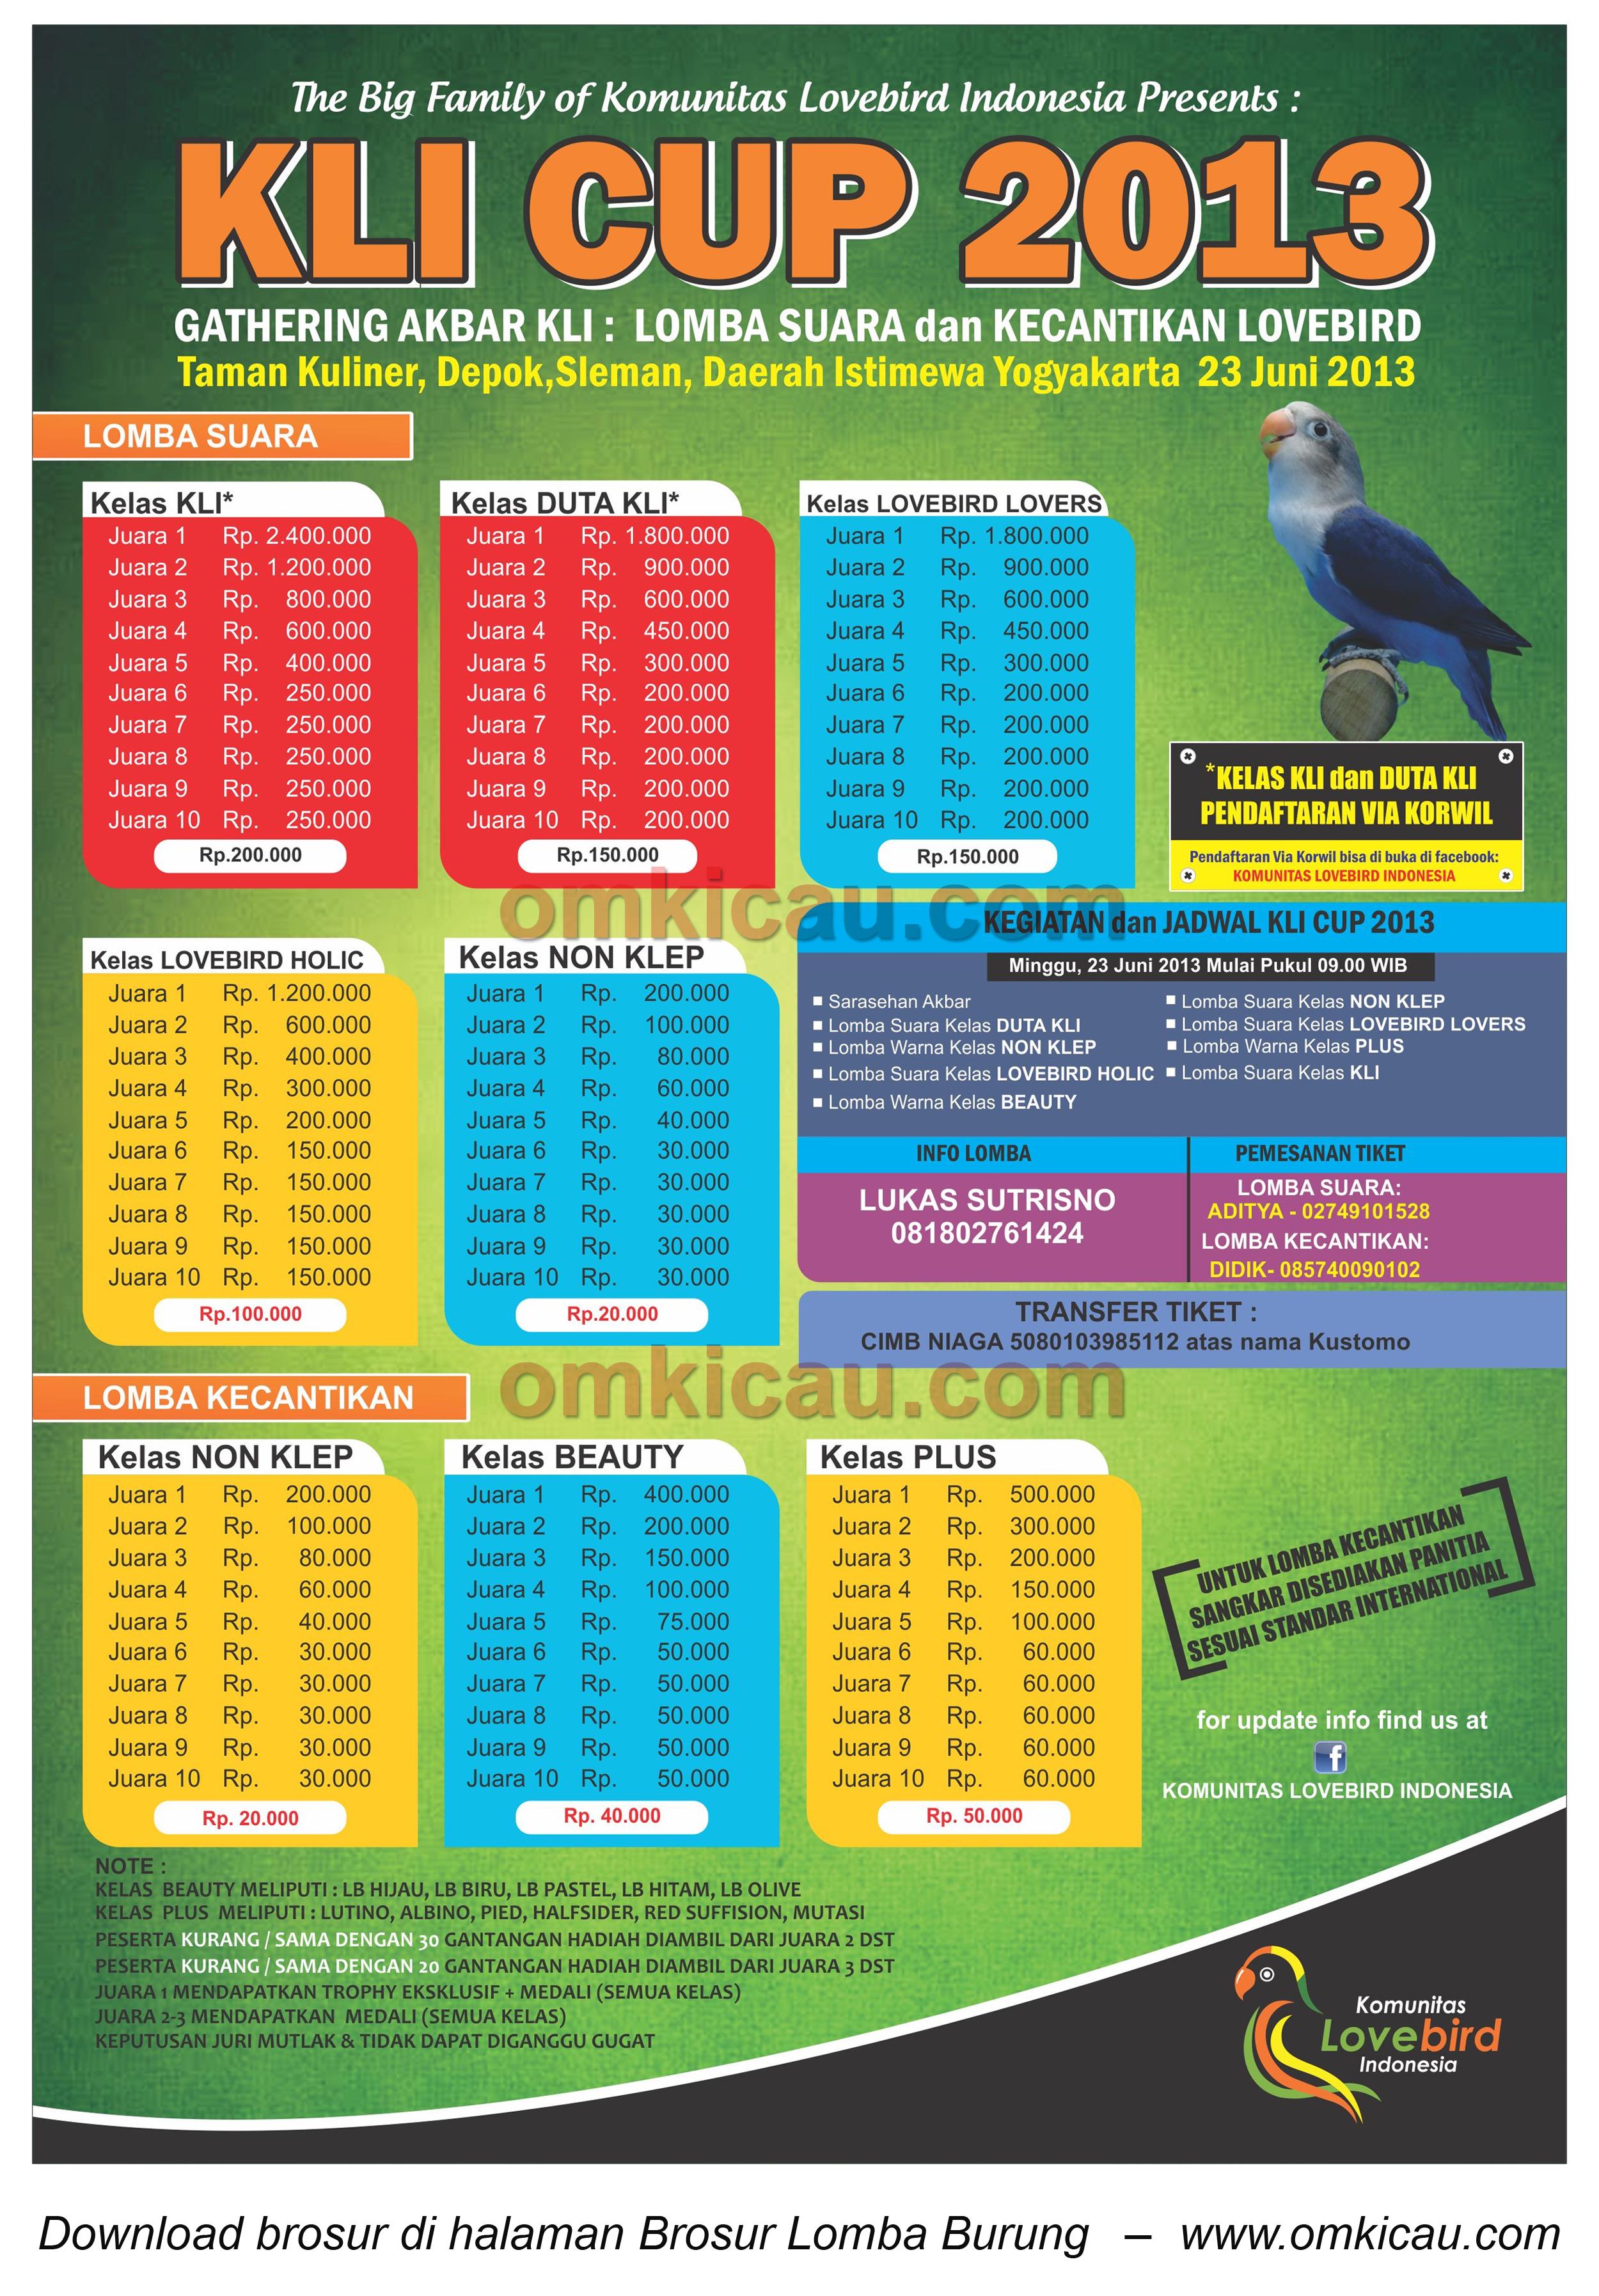 Brosur Lomba Burung KLI Cup - Jogja - 23 Juni 2013